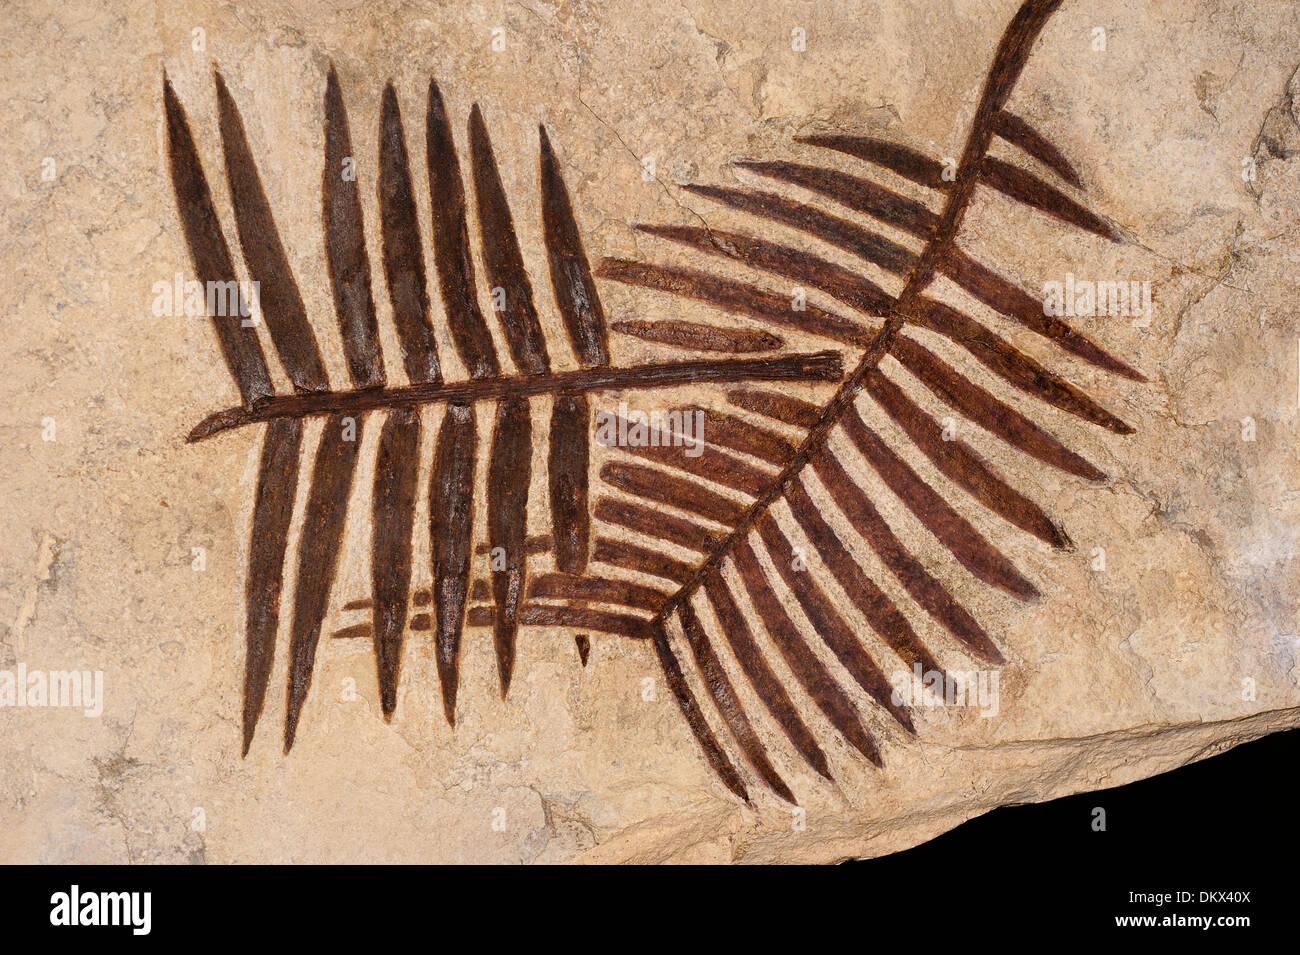 Zamites feneonis, Cycadophytes, Bennettitales, Mesozoic Age, Upper Giurassic, South France - Stock Image